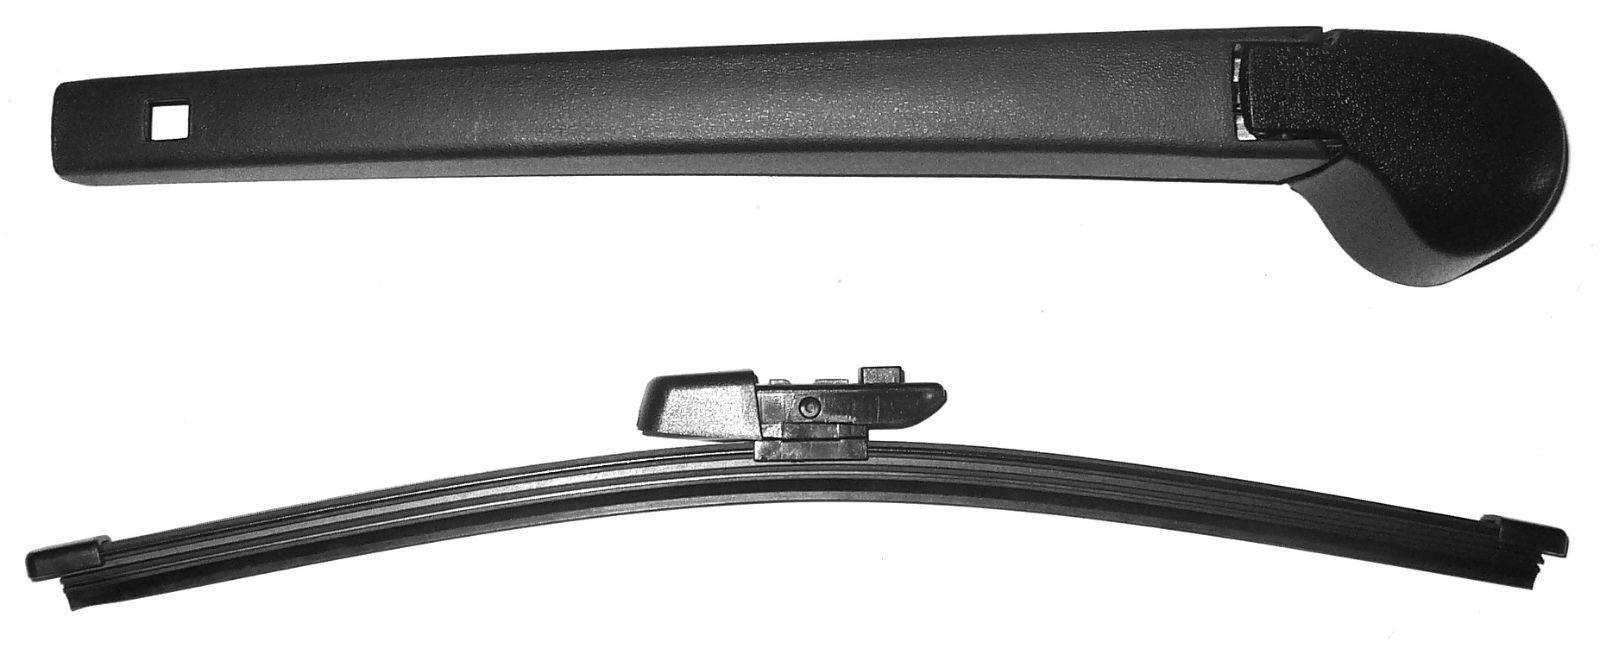 Brat stergator luneta VW Up! (Vw120), 04.2012-, Seat Mii 2012- cu lamela stergator de 250mm